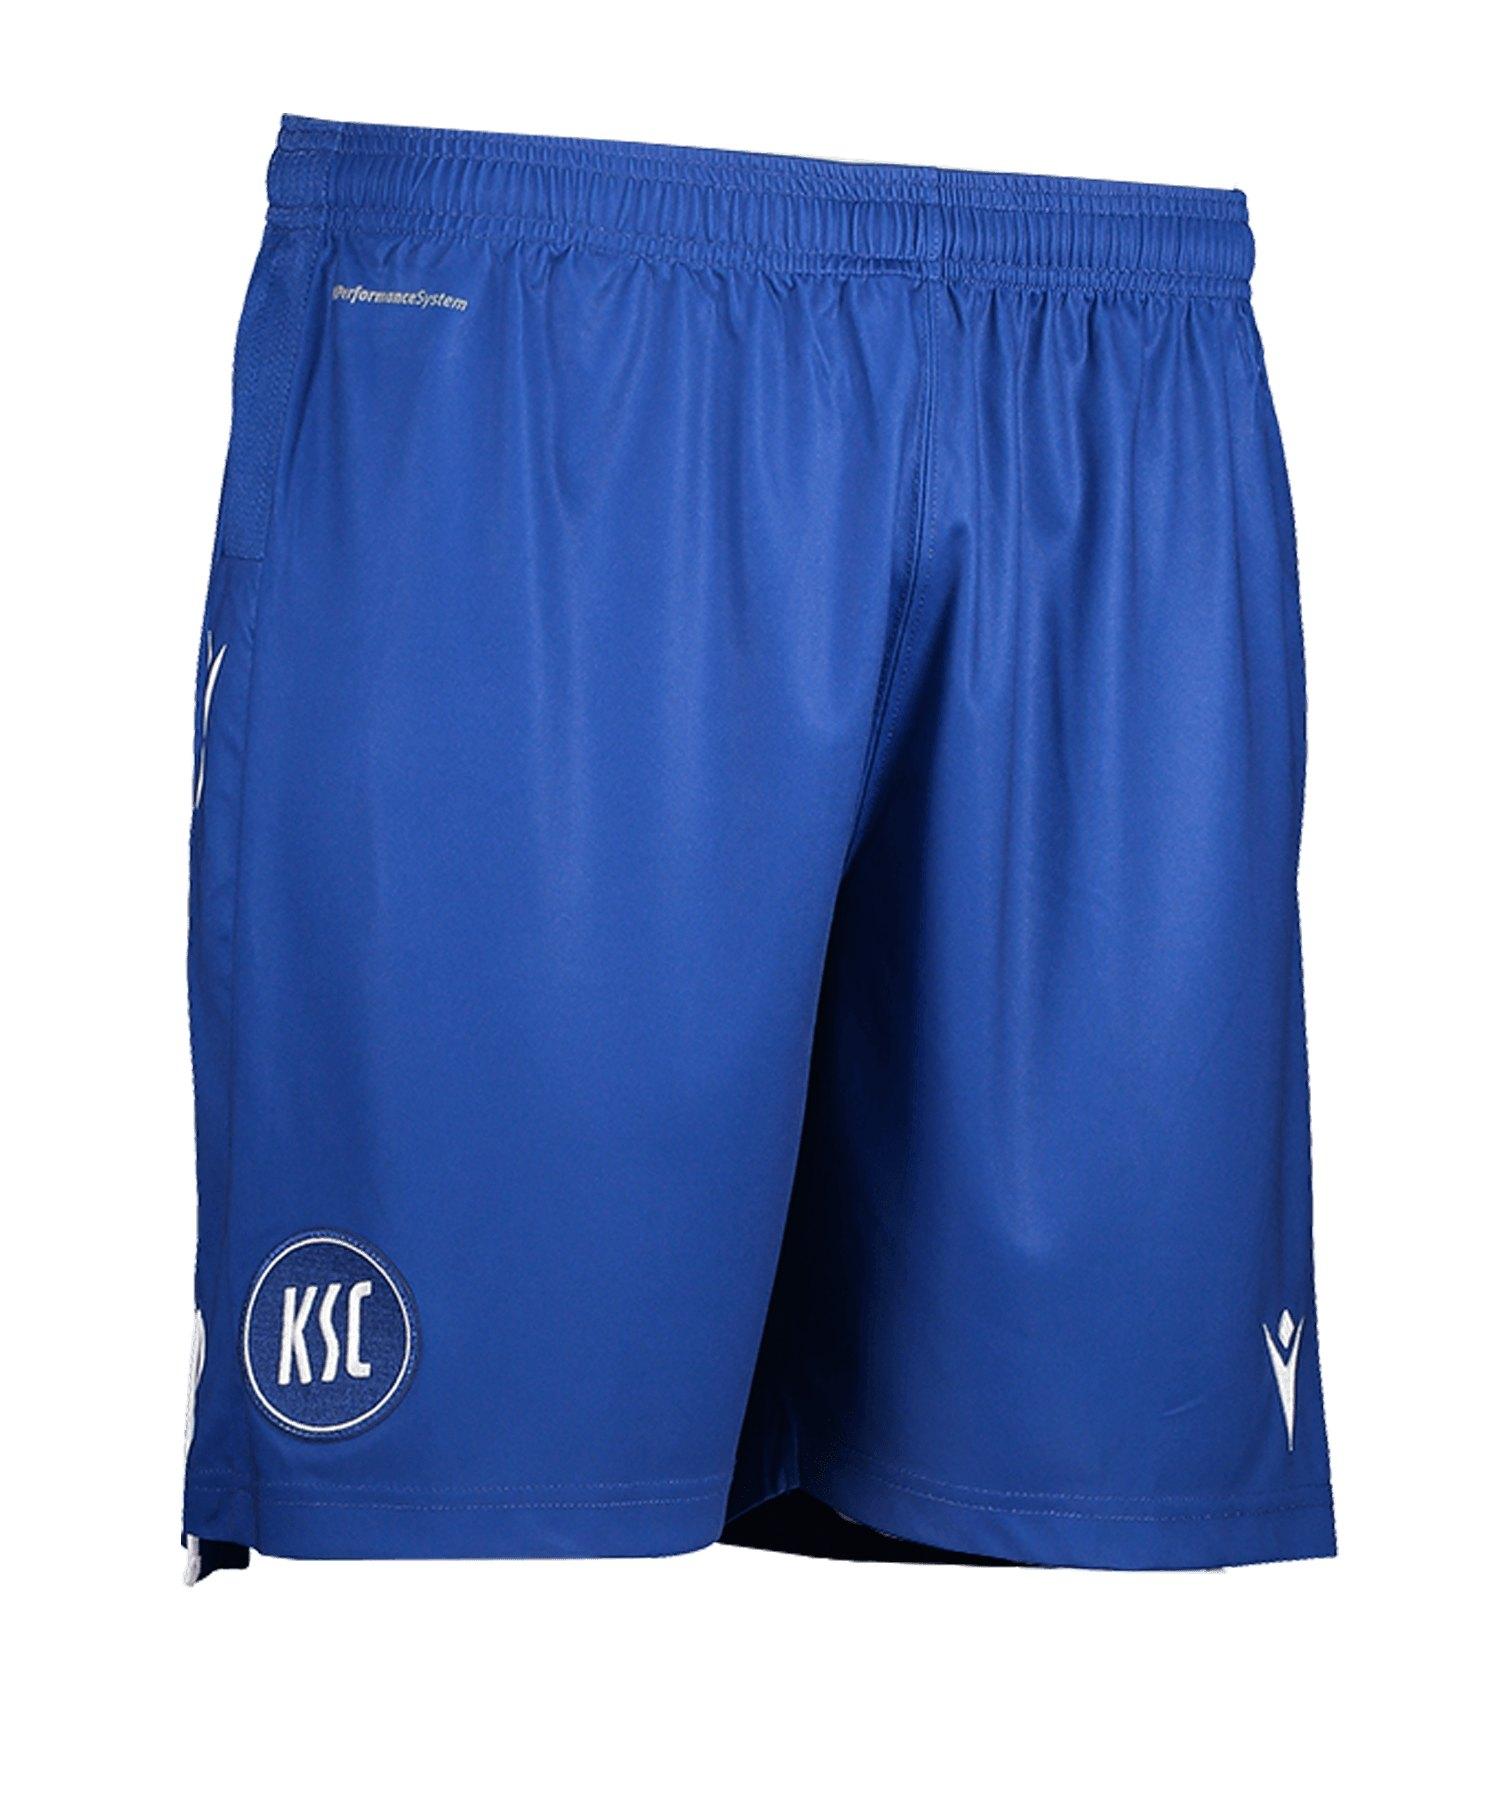 Macron Karlsruher SC Auth Short Home 19/20 Blau - blau